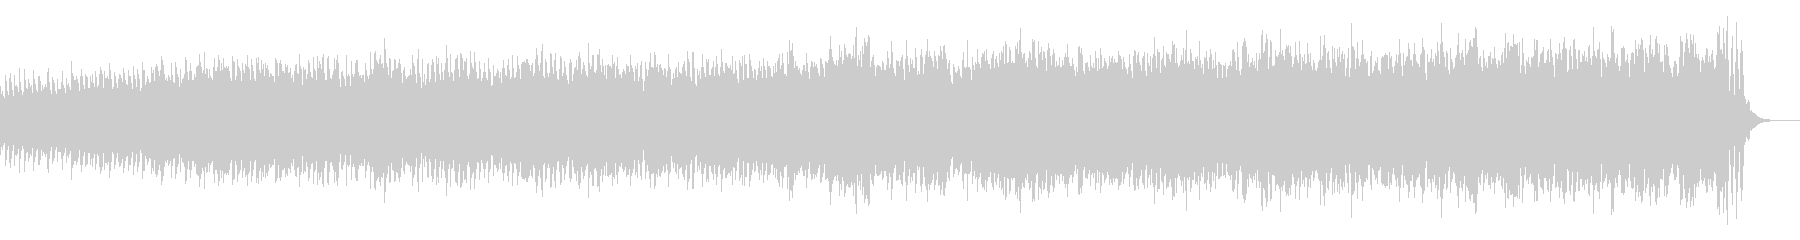 KANTピアノオーケストラ緊張感BGMの未再生の波形